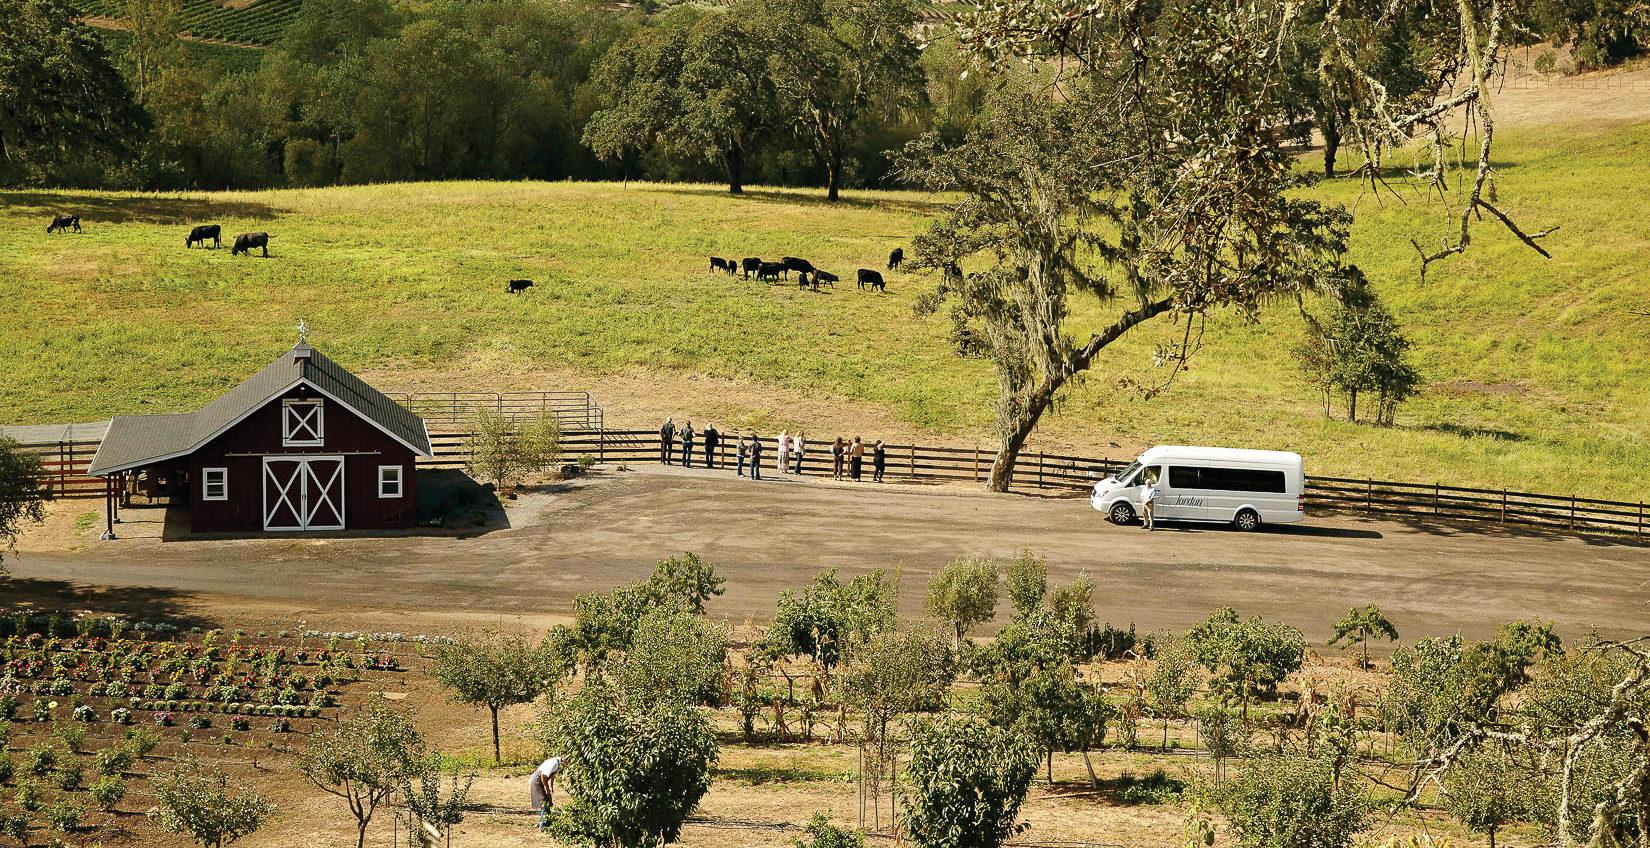 Landscape with barn, field, Jordan van and people